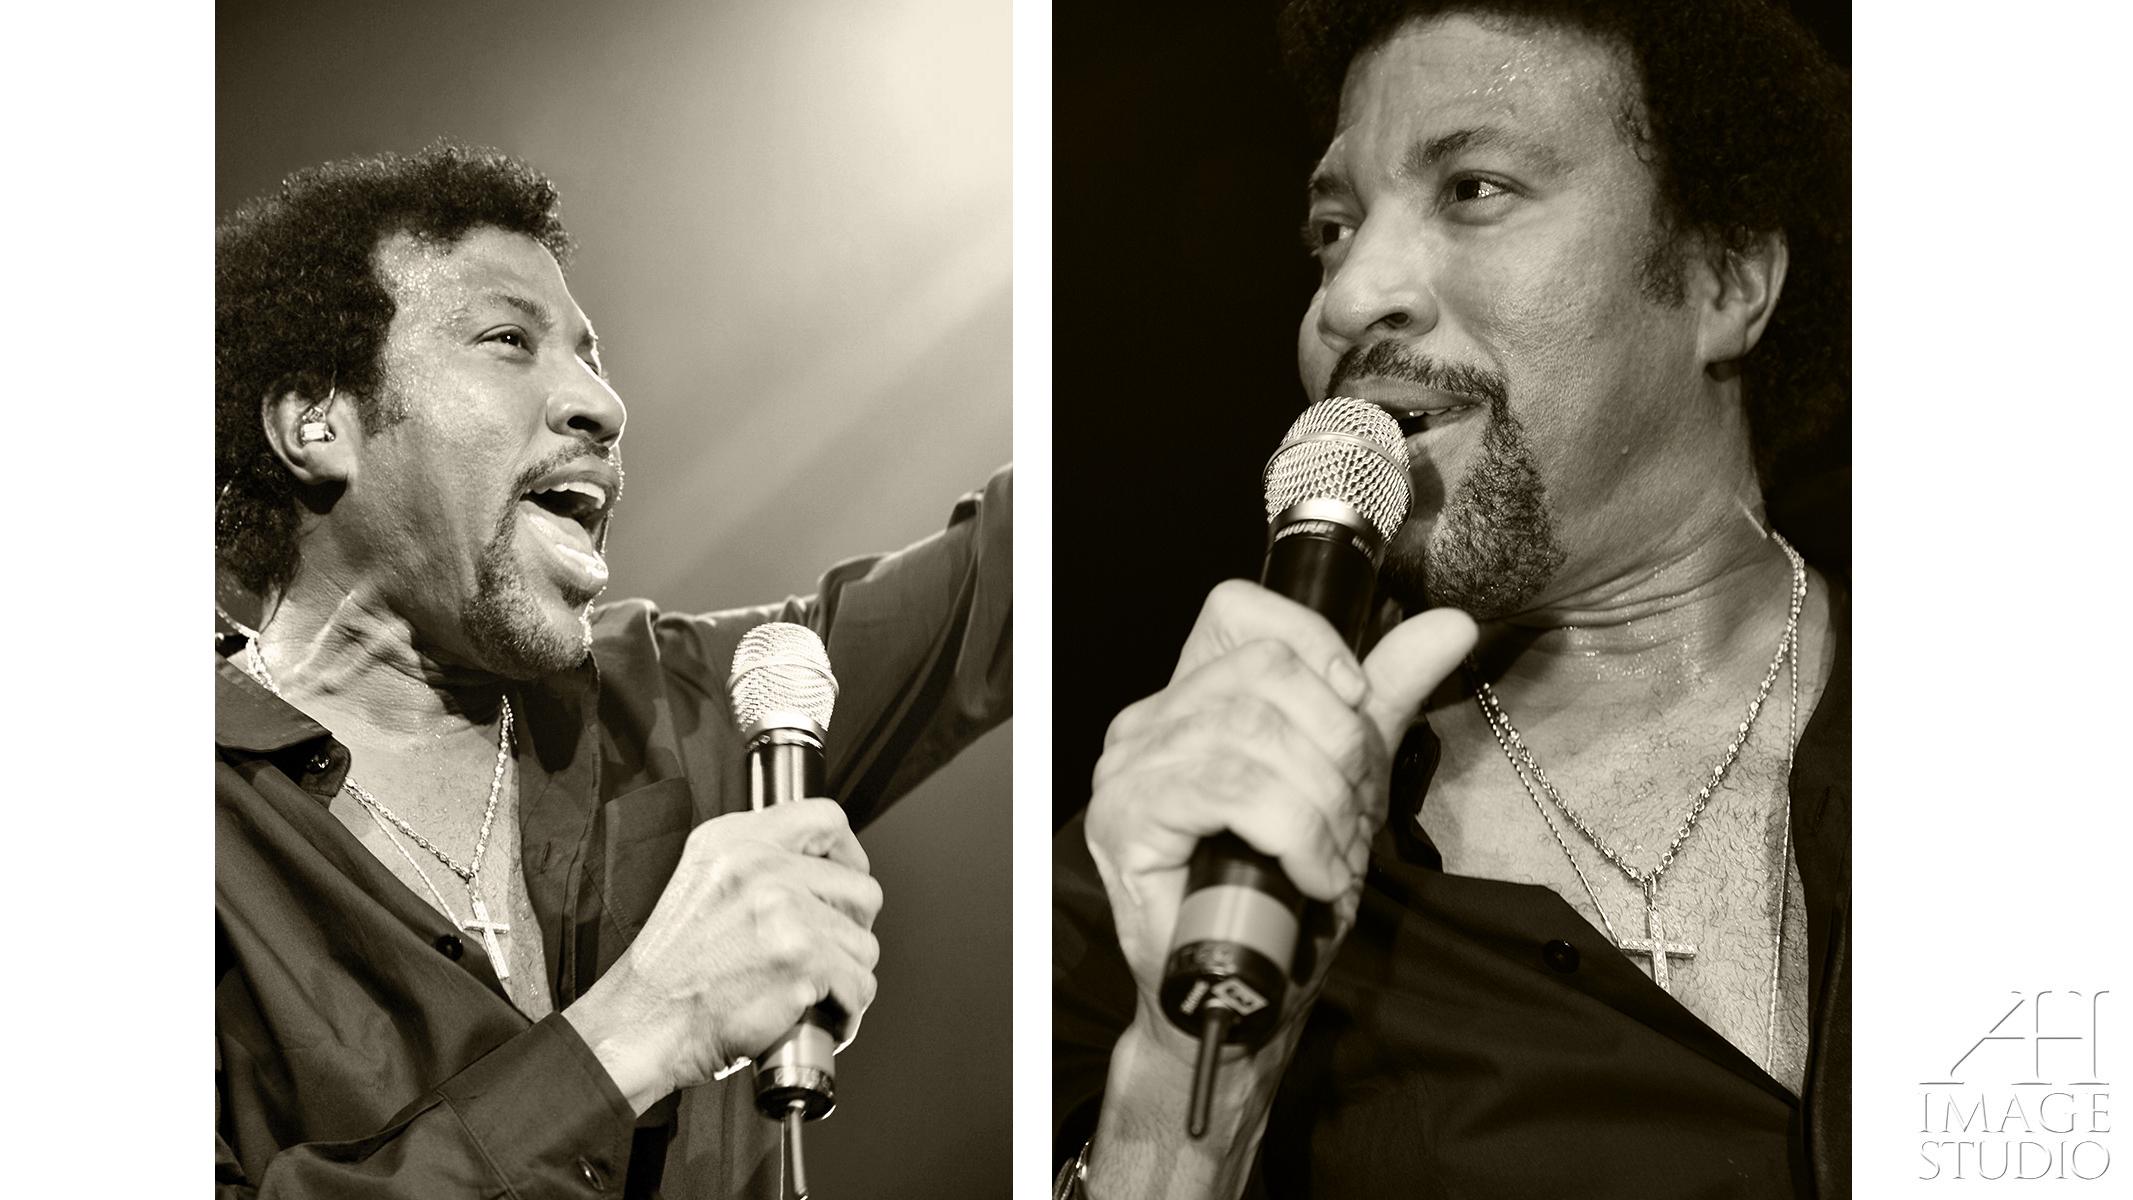 Lionel Richie celebrity concert photo